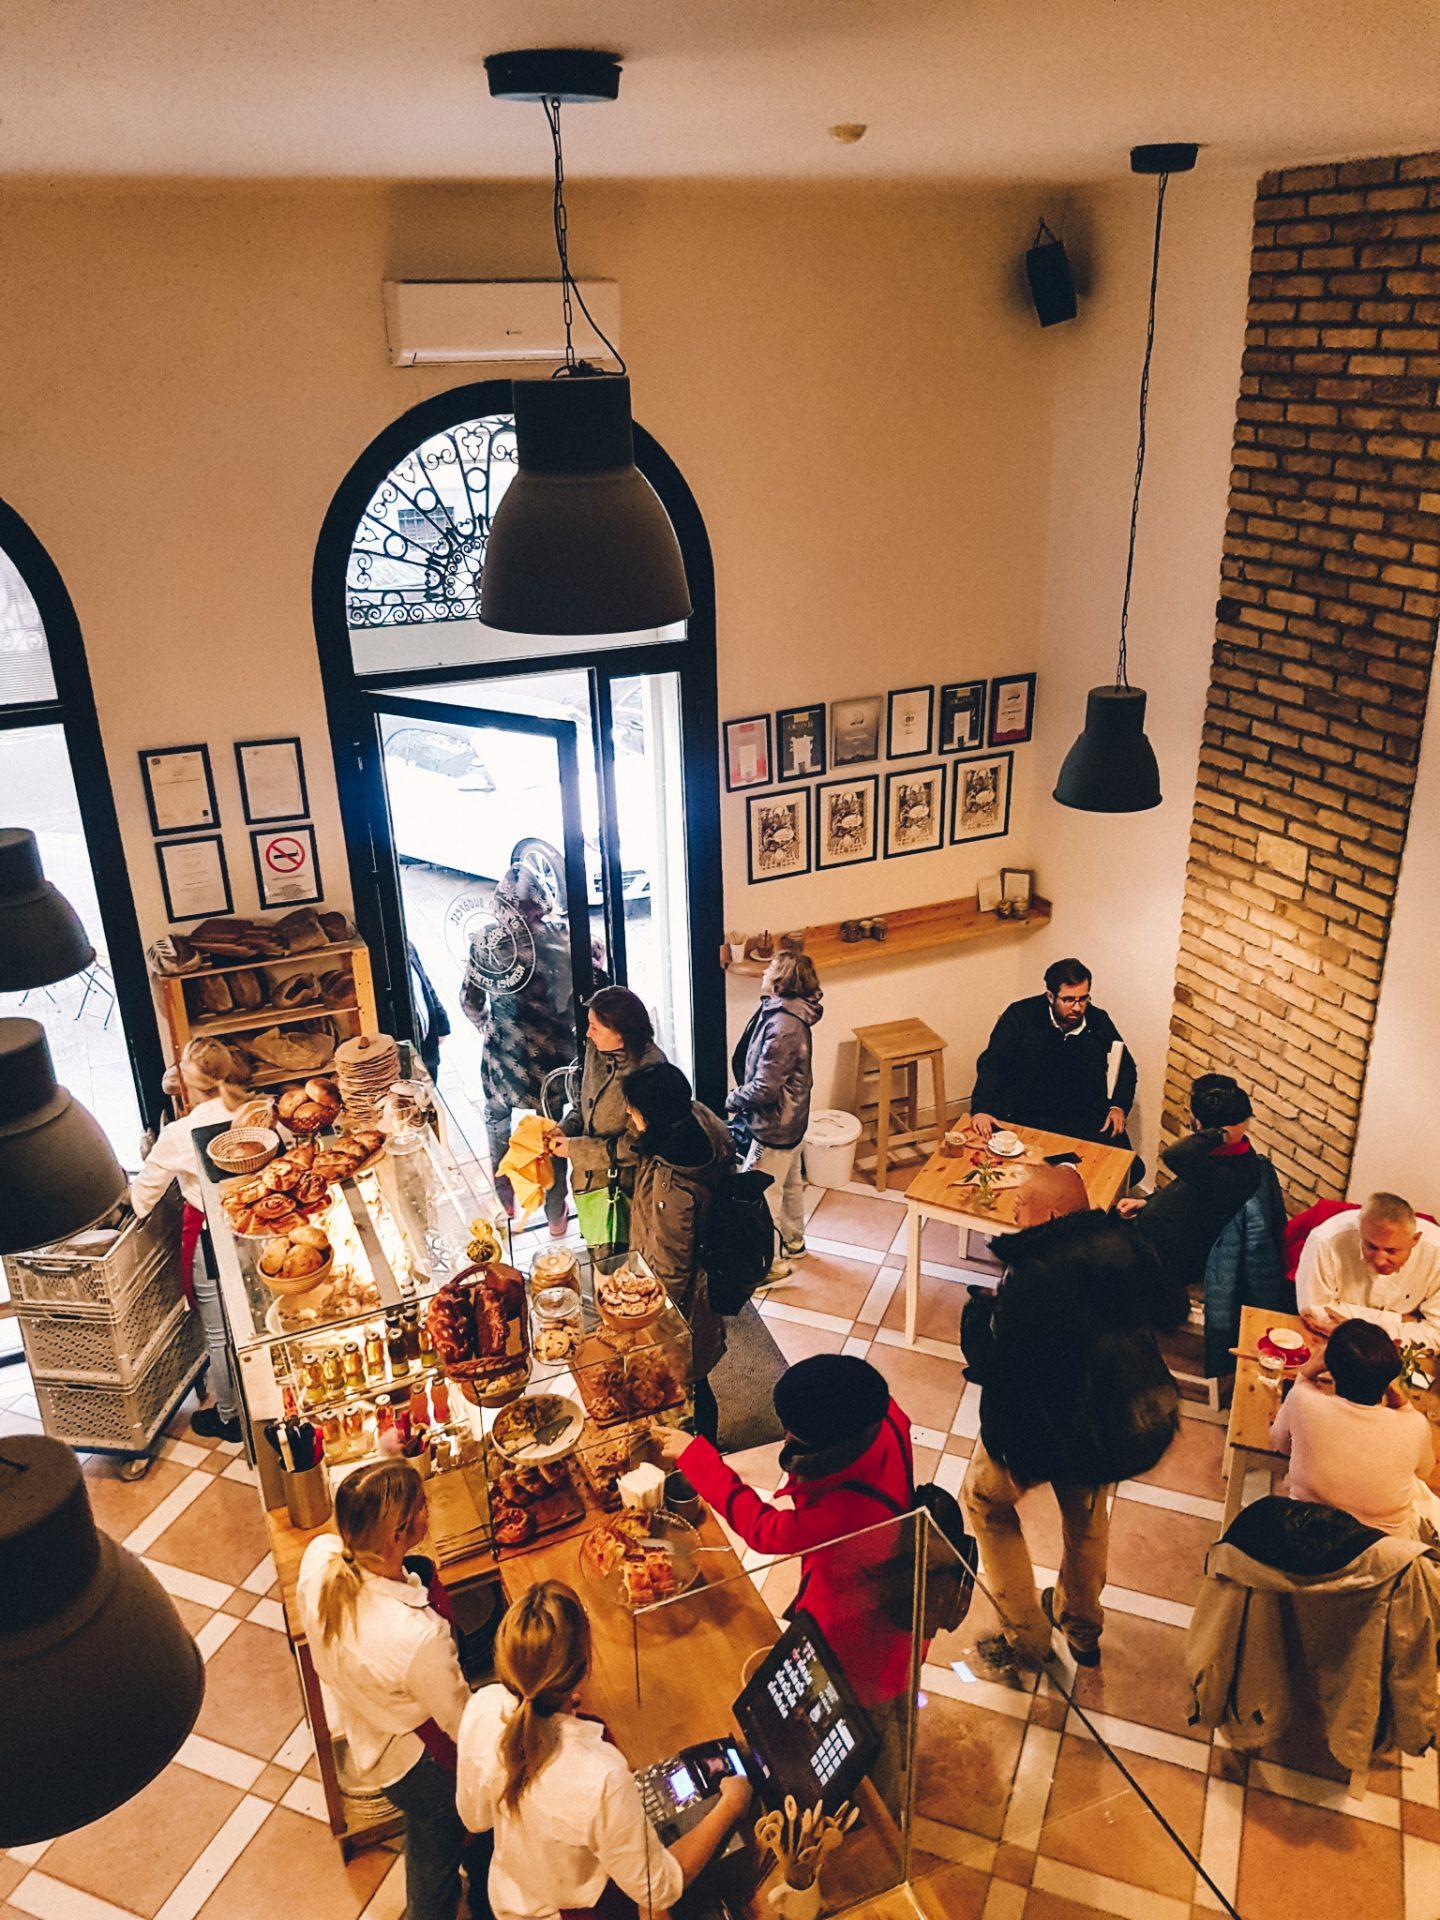 Artiźan Bakery is the best bakery in Budapest